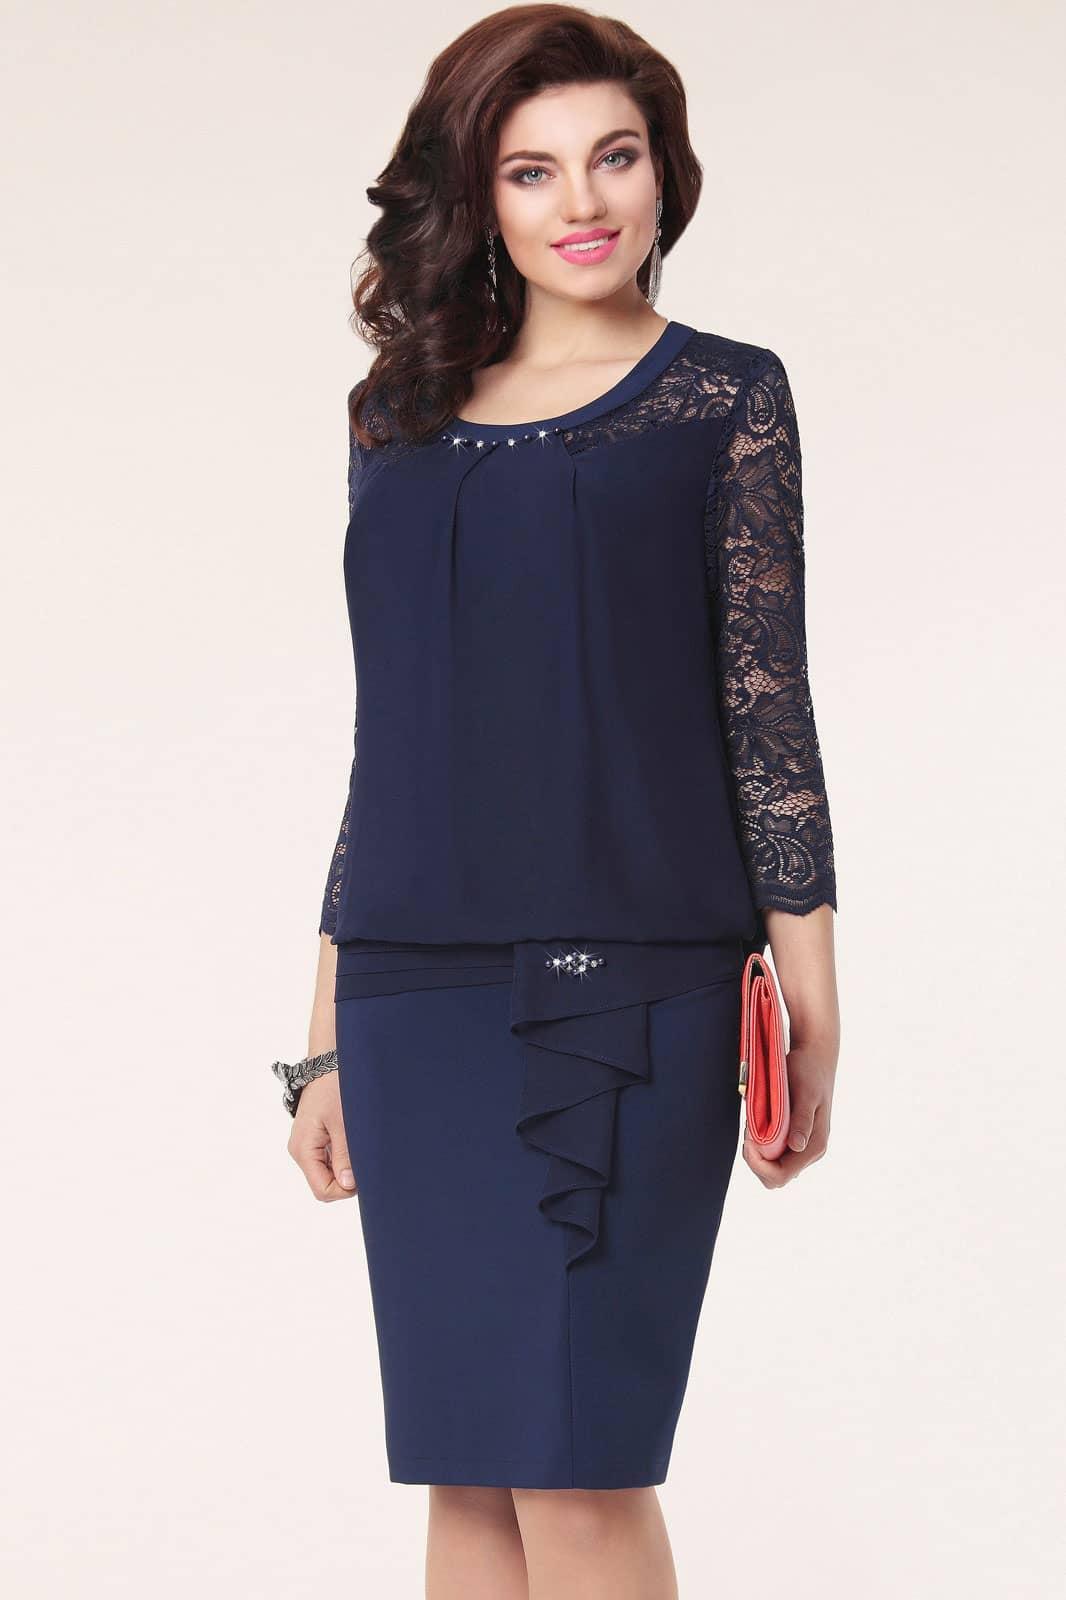 Платье Vittoria Queen 1093/1 Темно-синий - фото 1